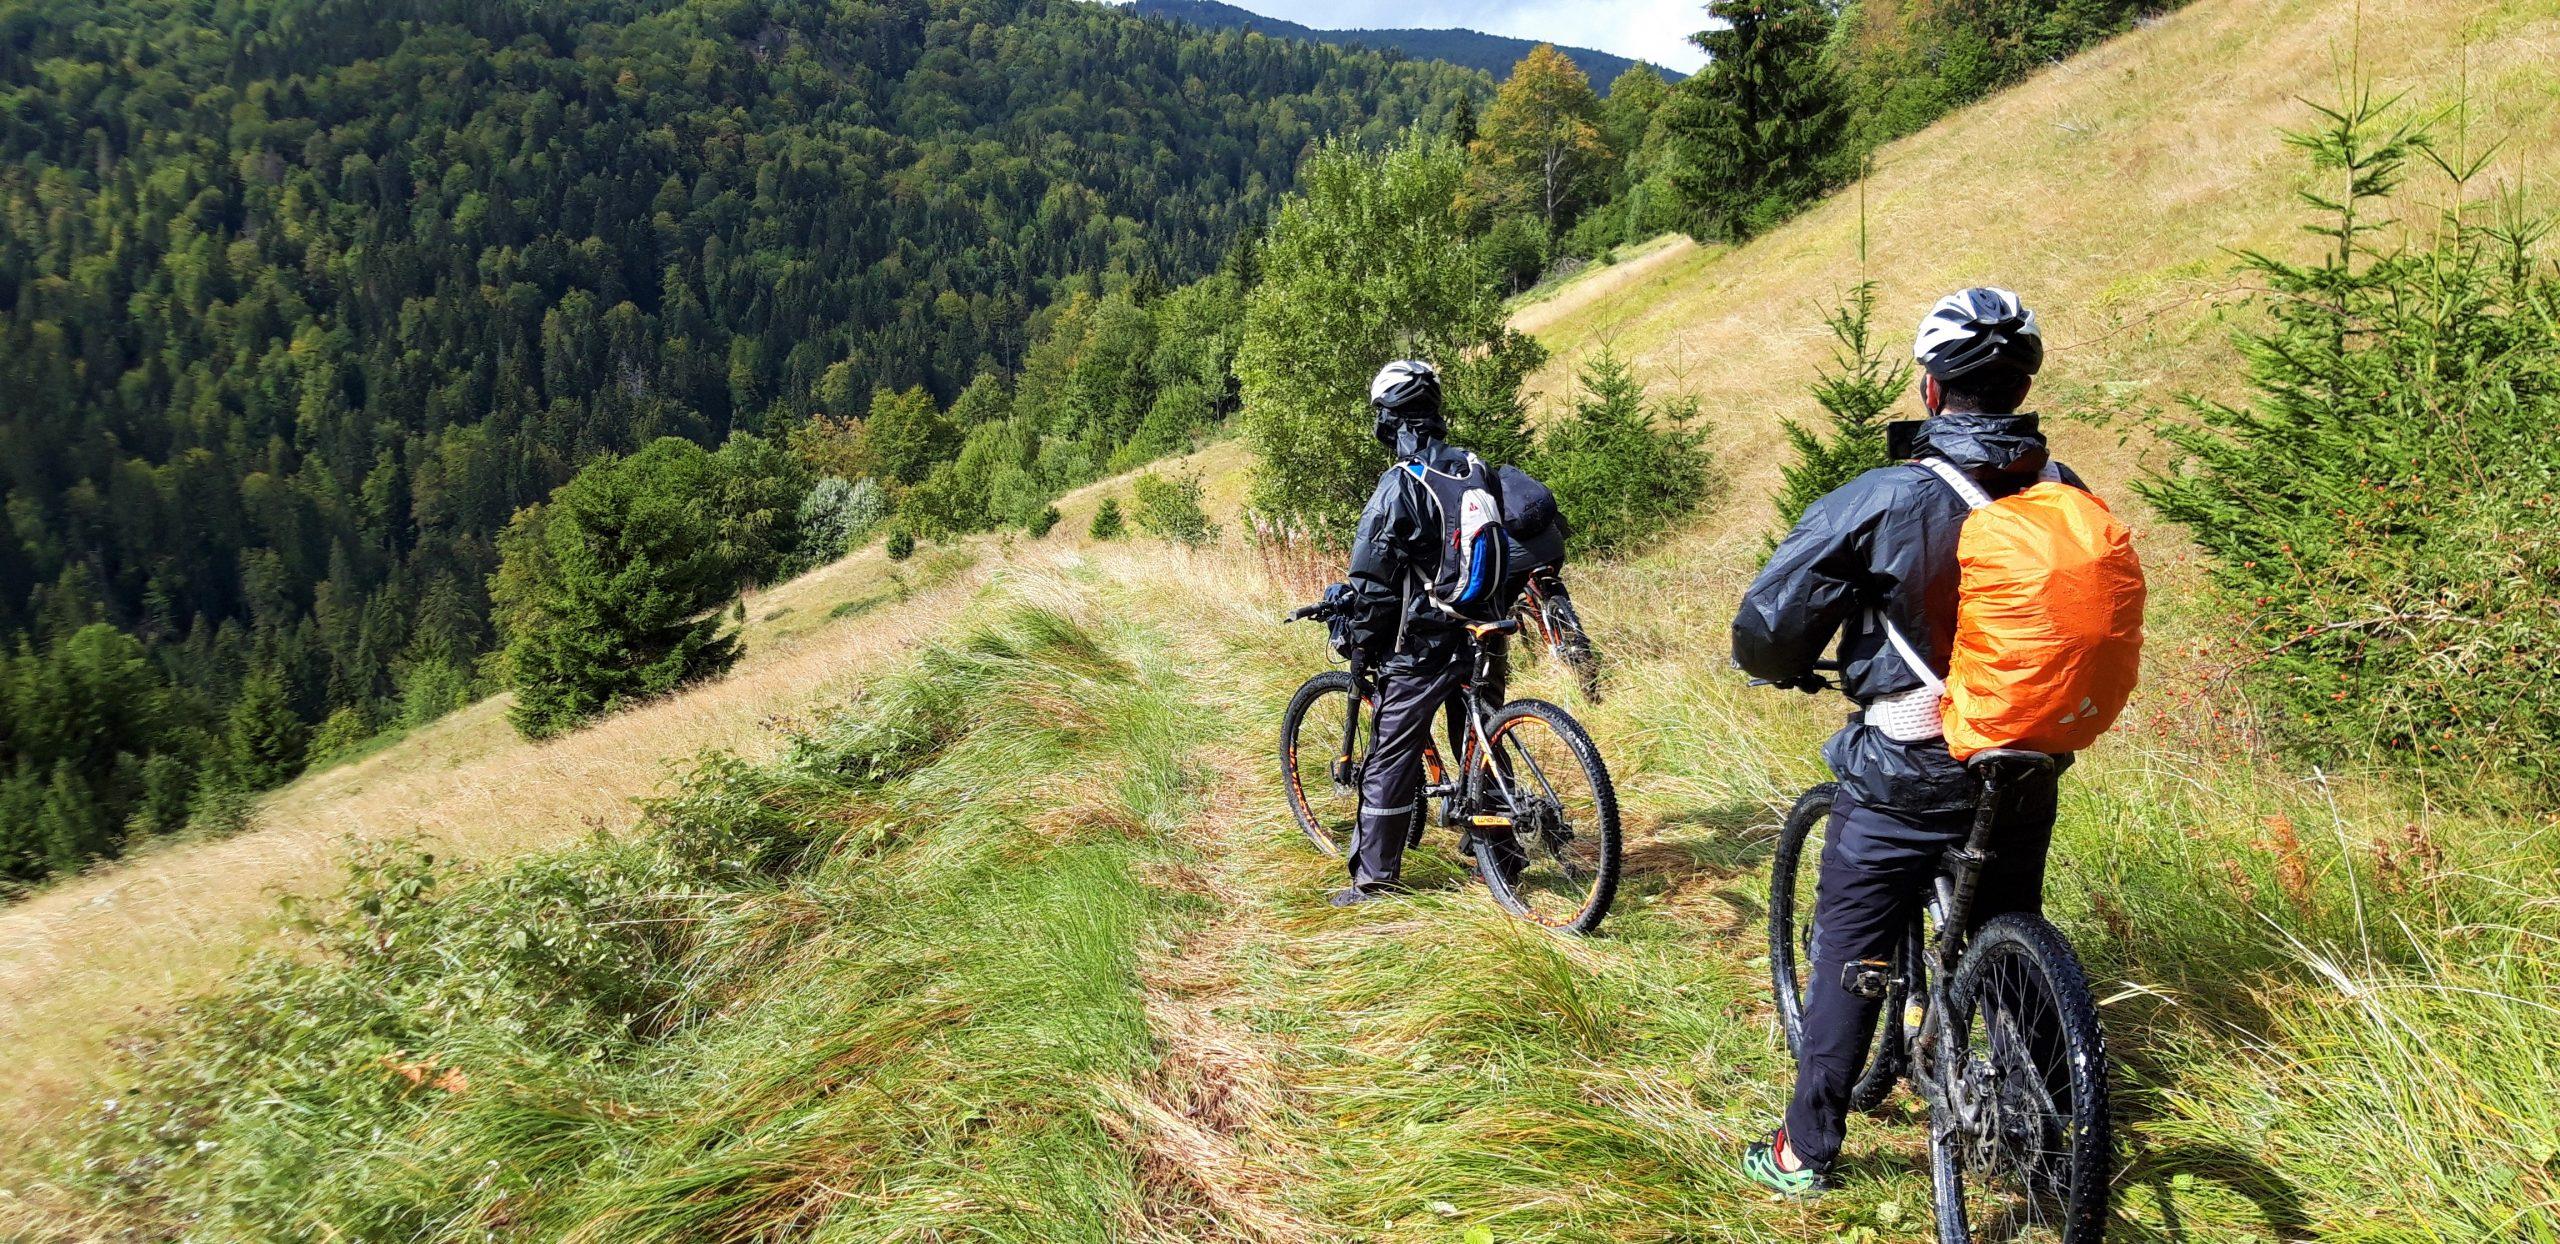 Biking Tour Peaks Of The Balkans